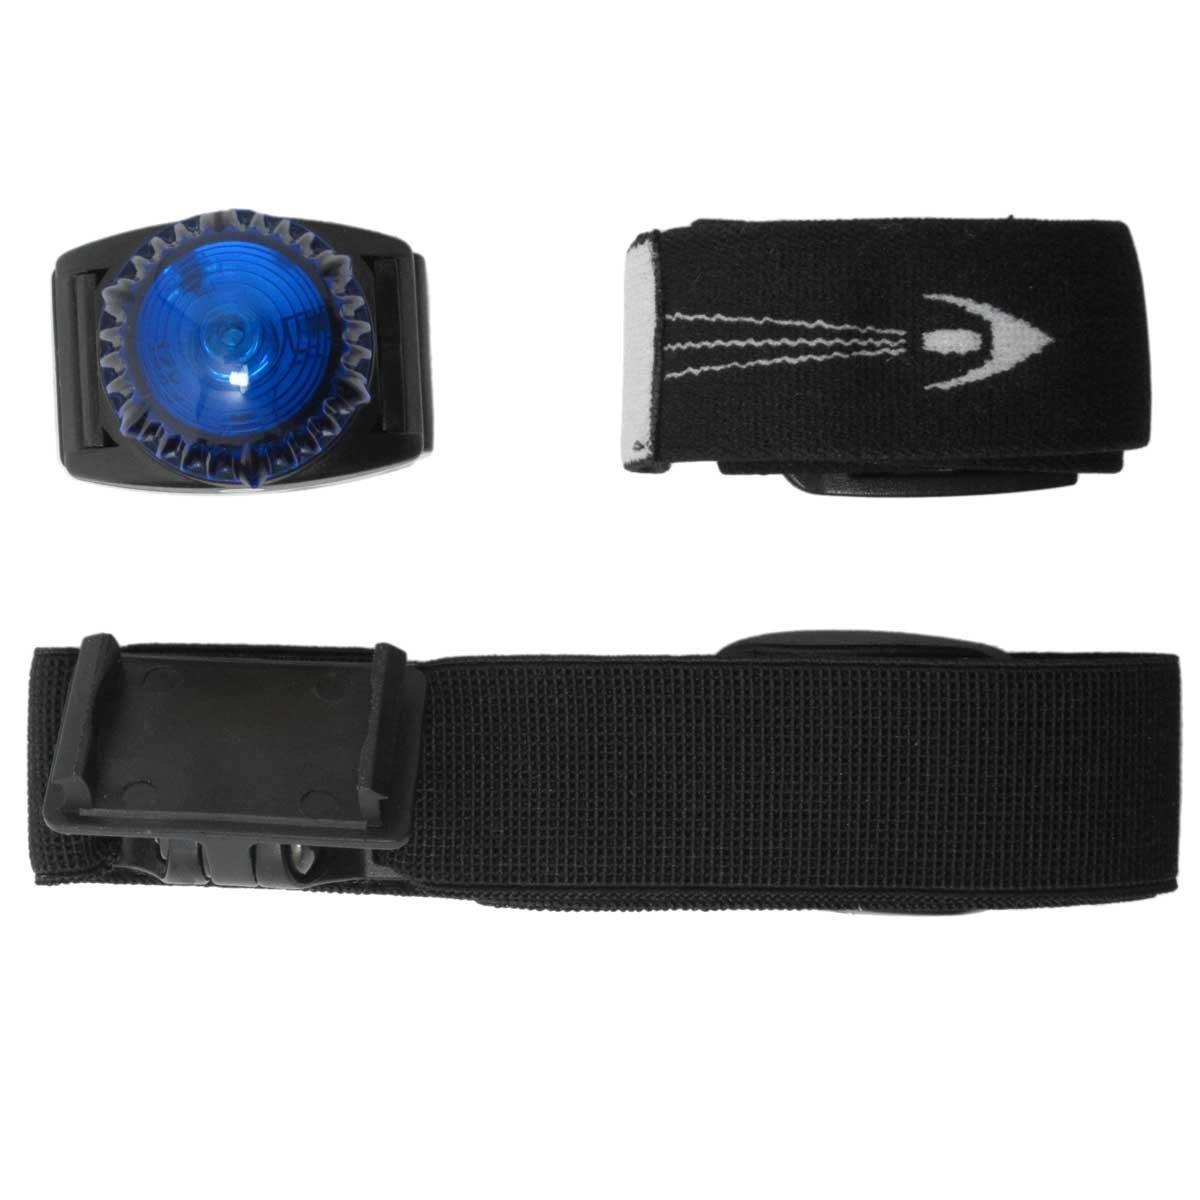 NightGear Visual Person Marker - Adventurer Accessory Pack - Polycarbonate Belt Clip - Soft Headband - Soft Armband (Blue)